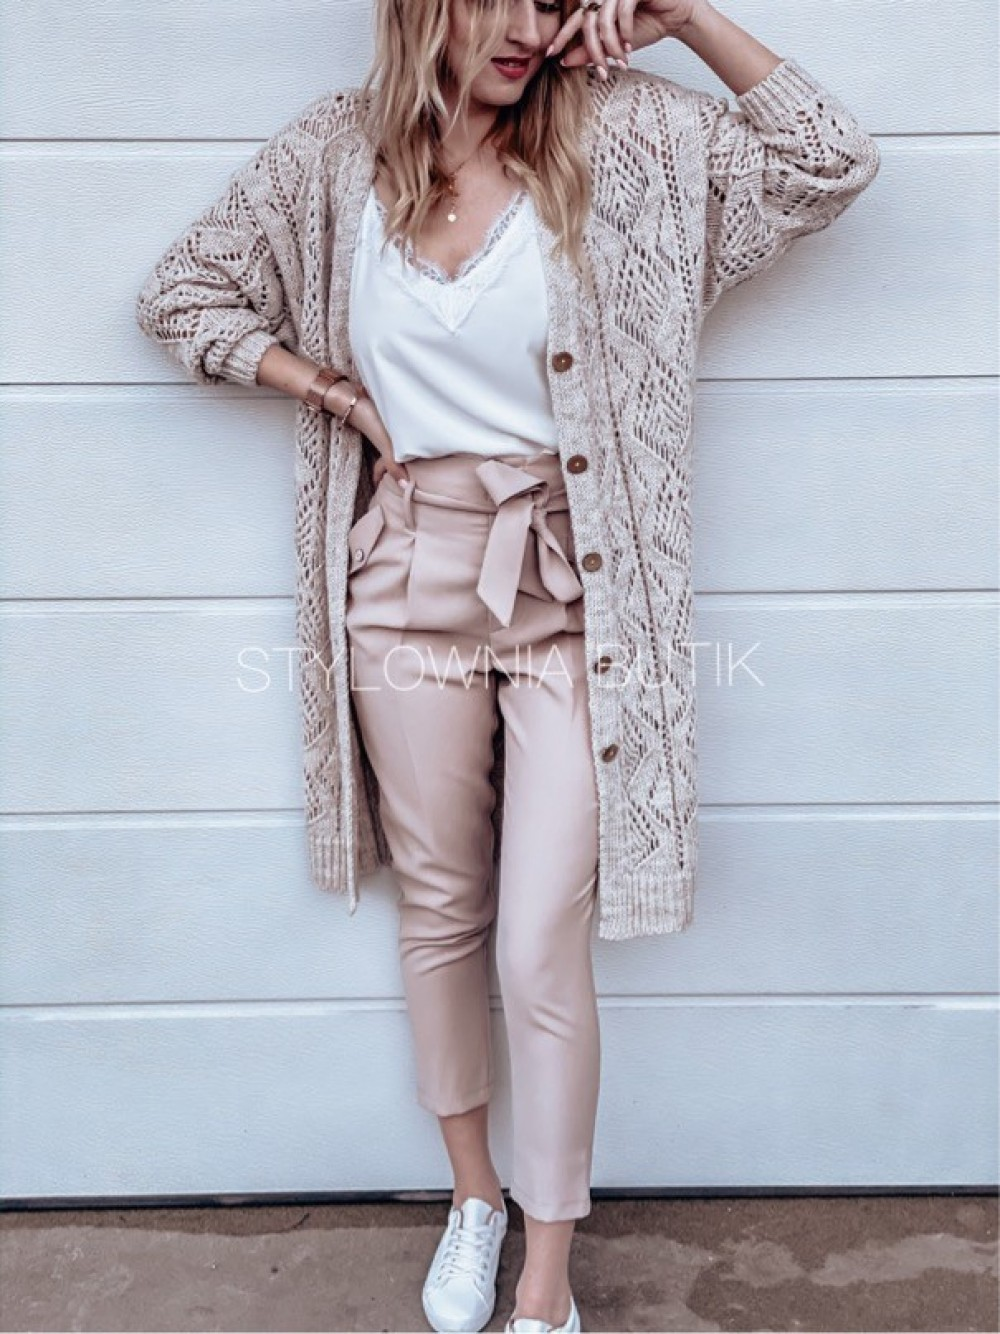 Spodnie eleganckie Stylownia lifestyle, fashion, clothes